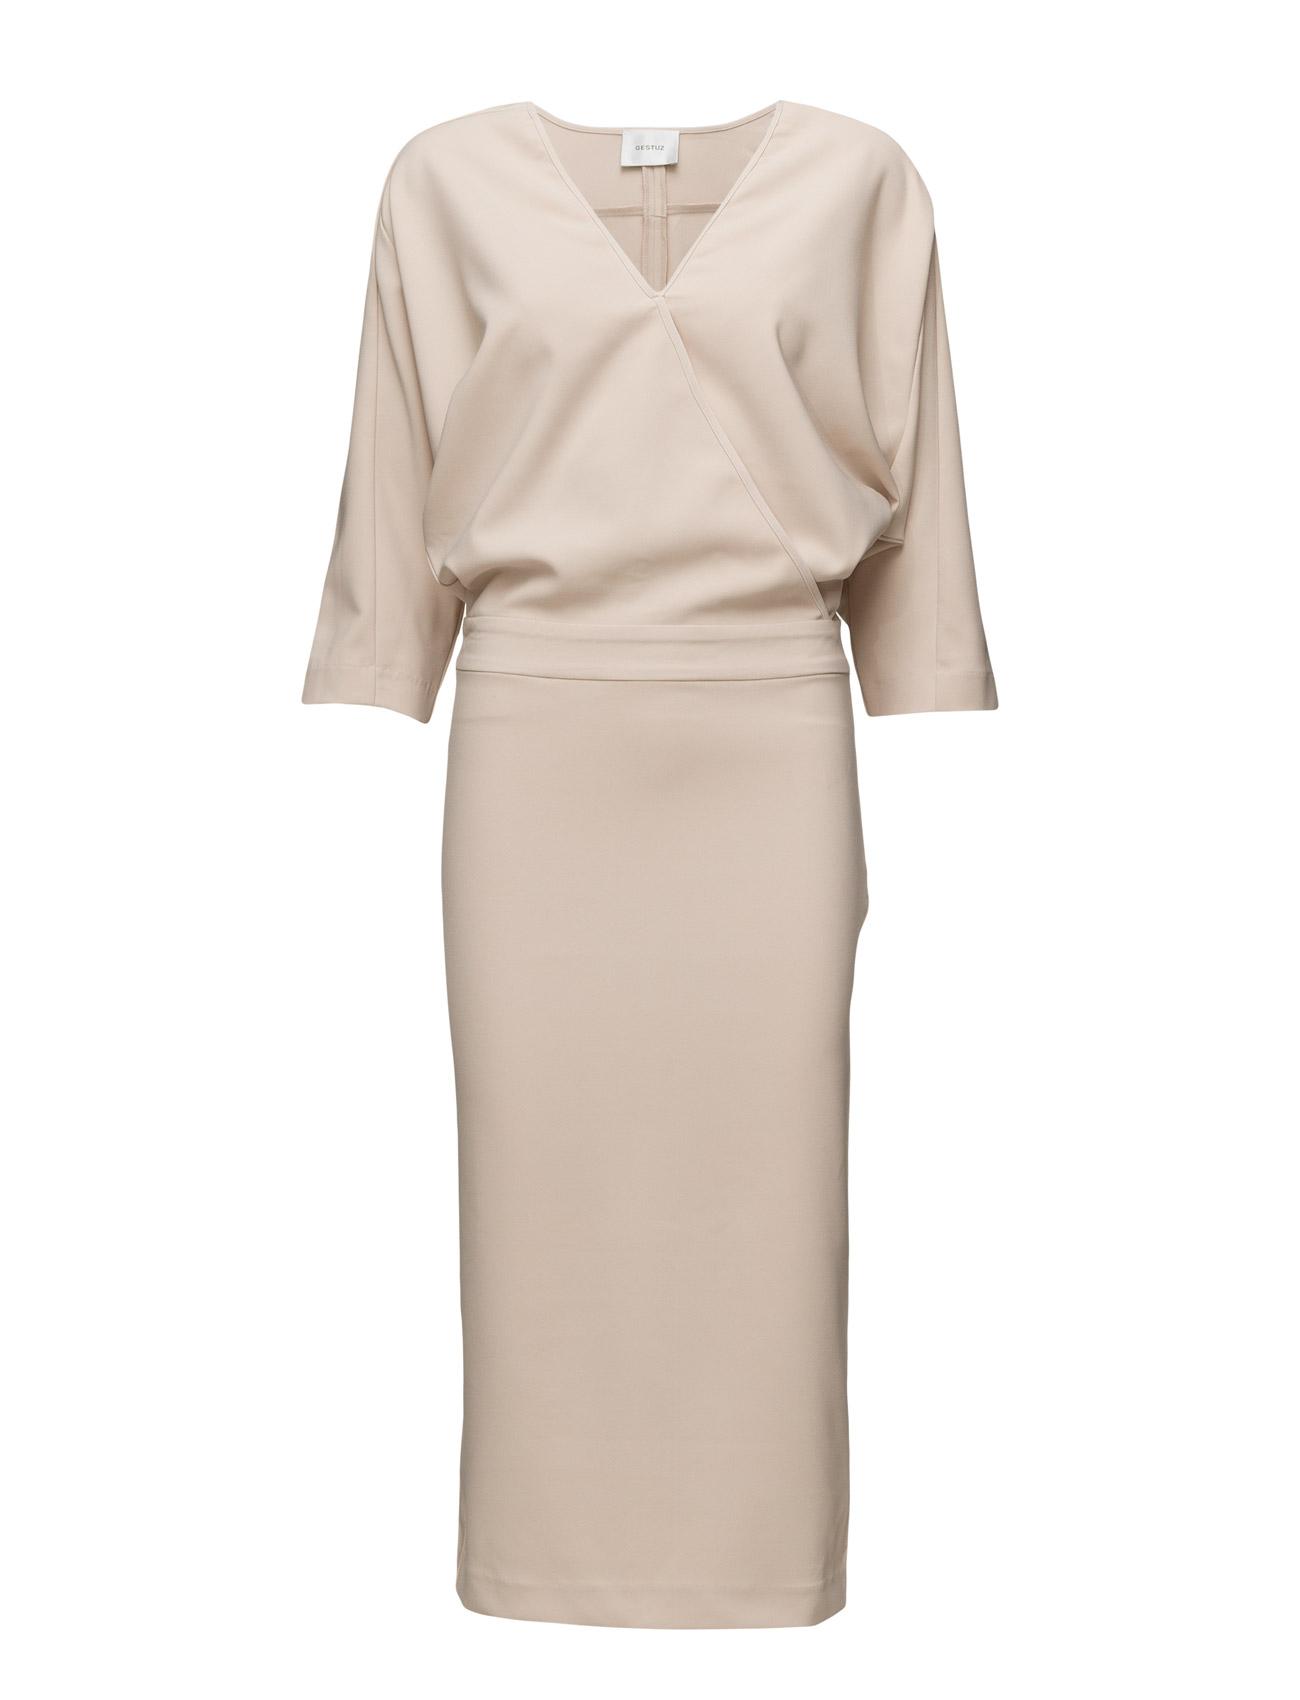 Joelle Dress Ms16 Gestuz Maxi Kjoler til Kvinder i Deep Well